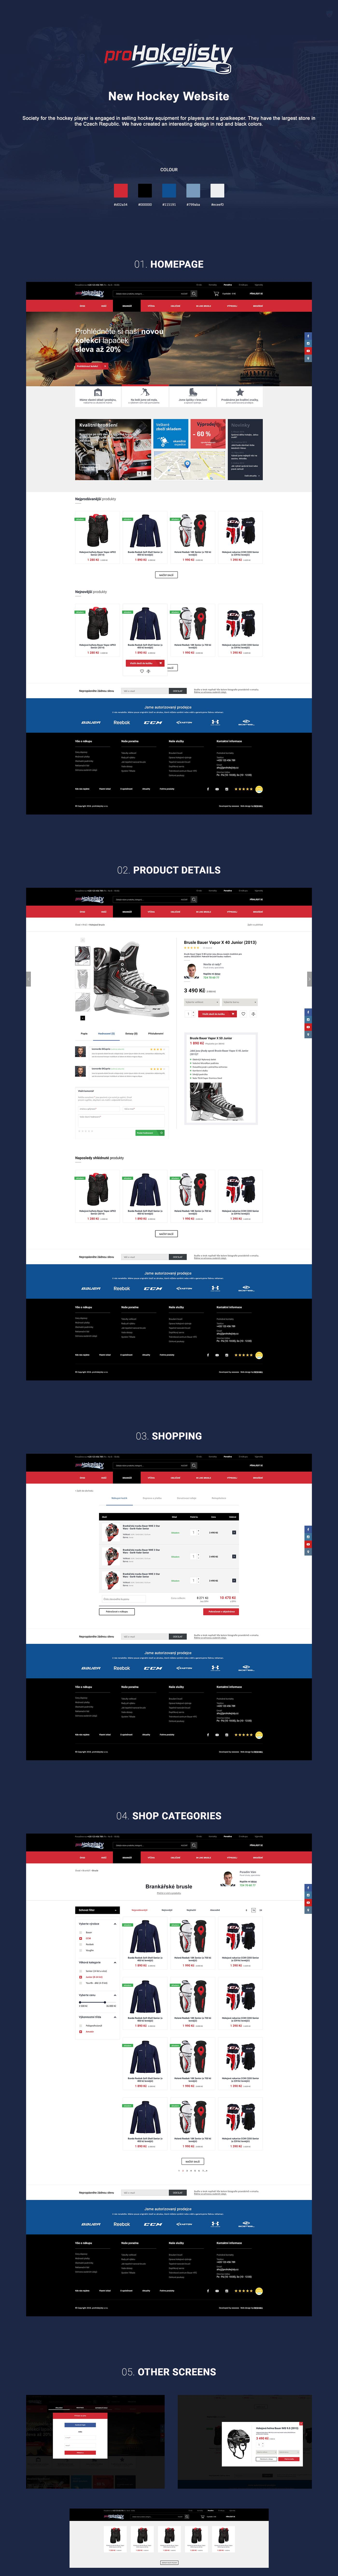 hockey freshmill. digital Web design sport store shop logo Ecommerce Jaroslav hach